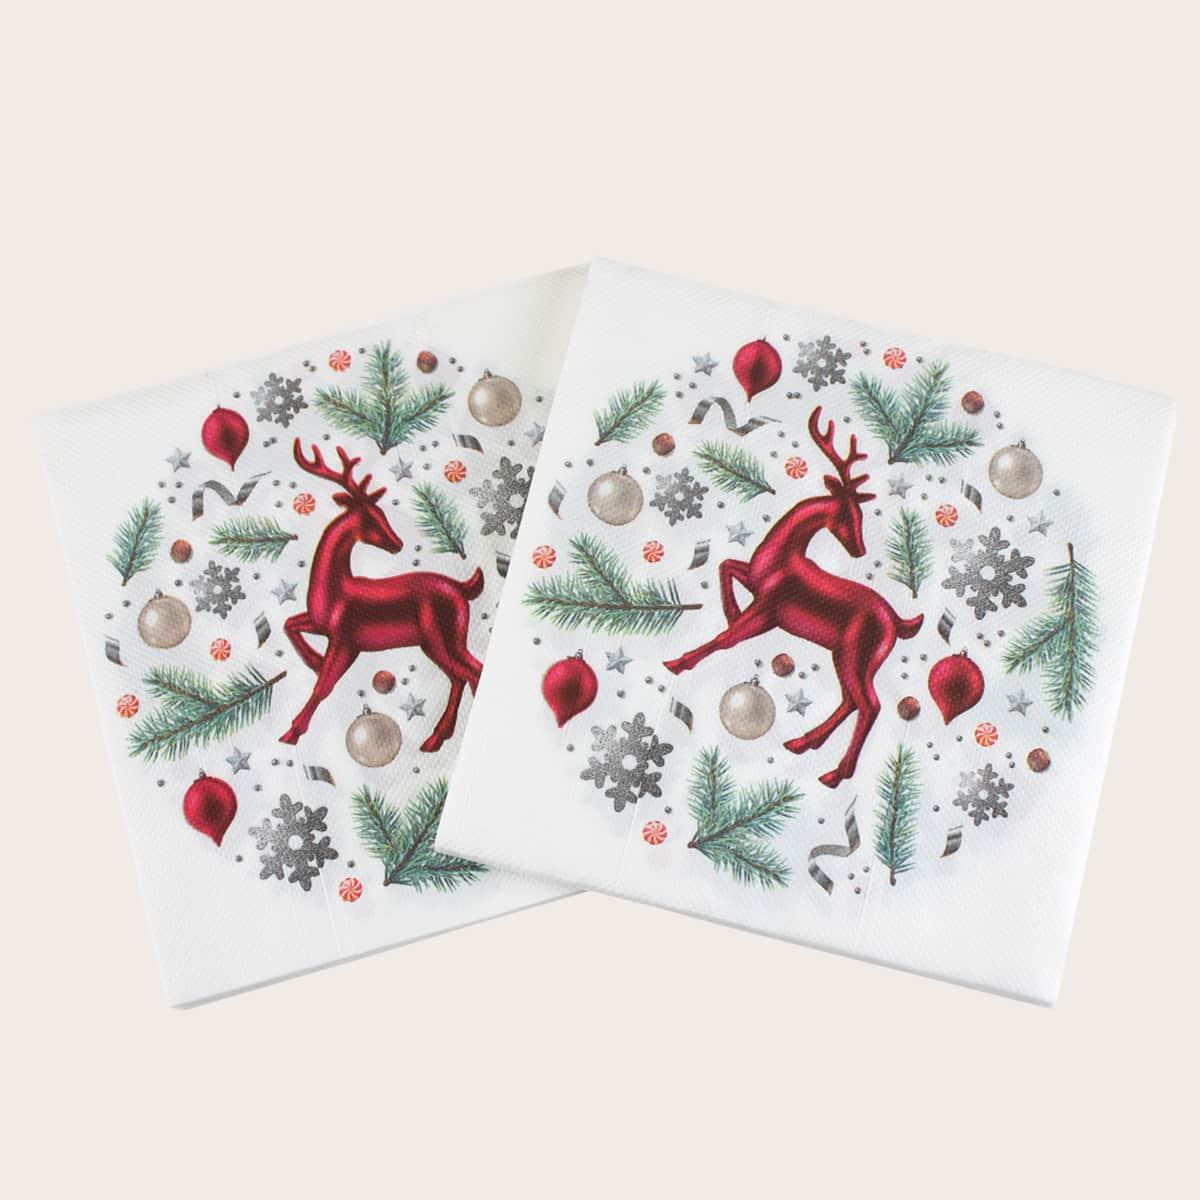 20pcs Christmas Deer Print Disposable Napkin